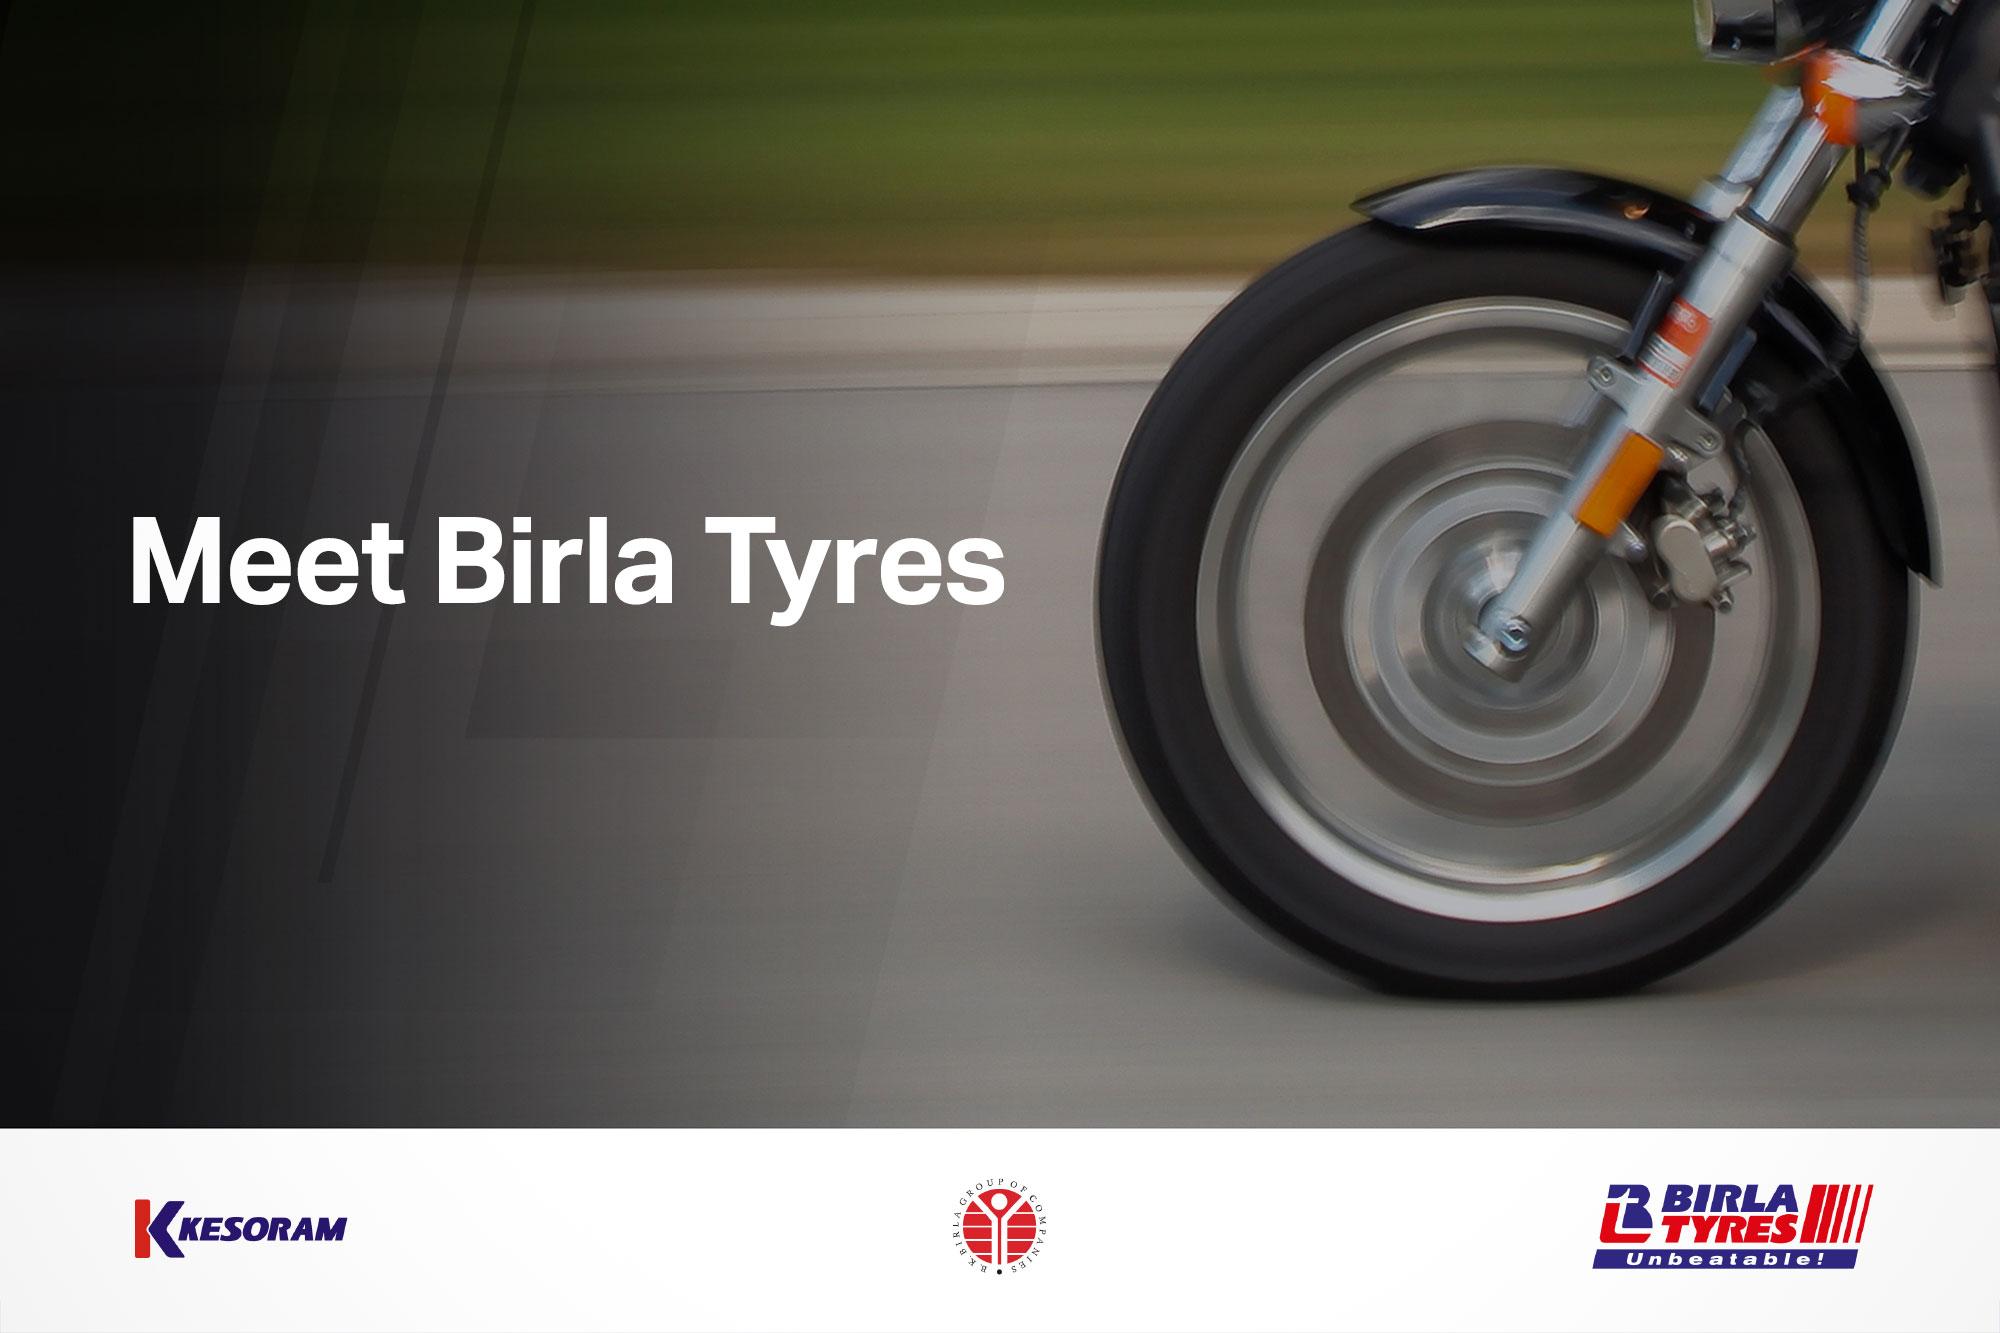 Birla-Tyres-Visual-Identity-and-Website-by-Hensley-Partners.jpg